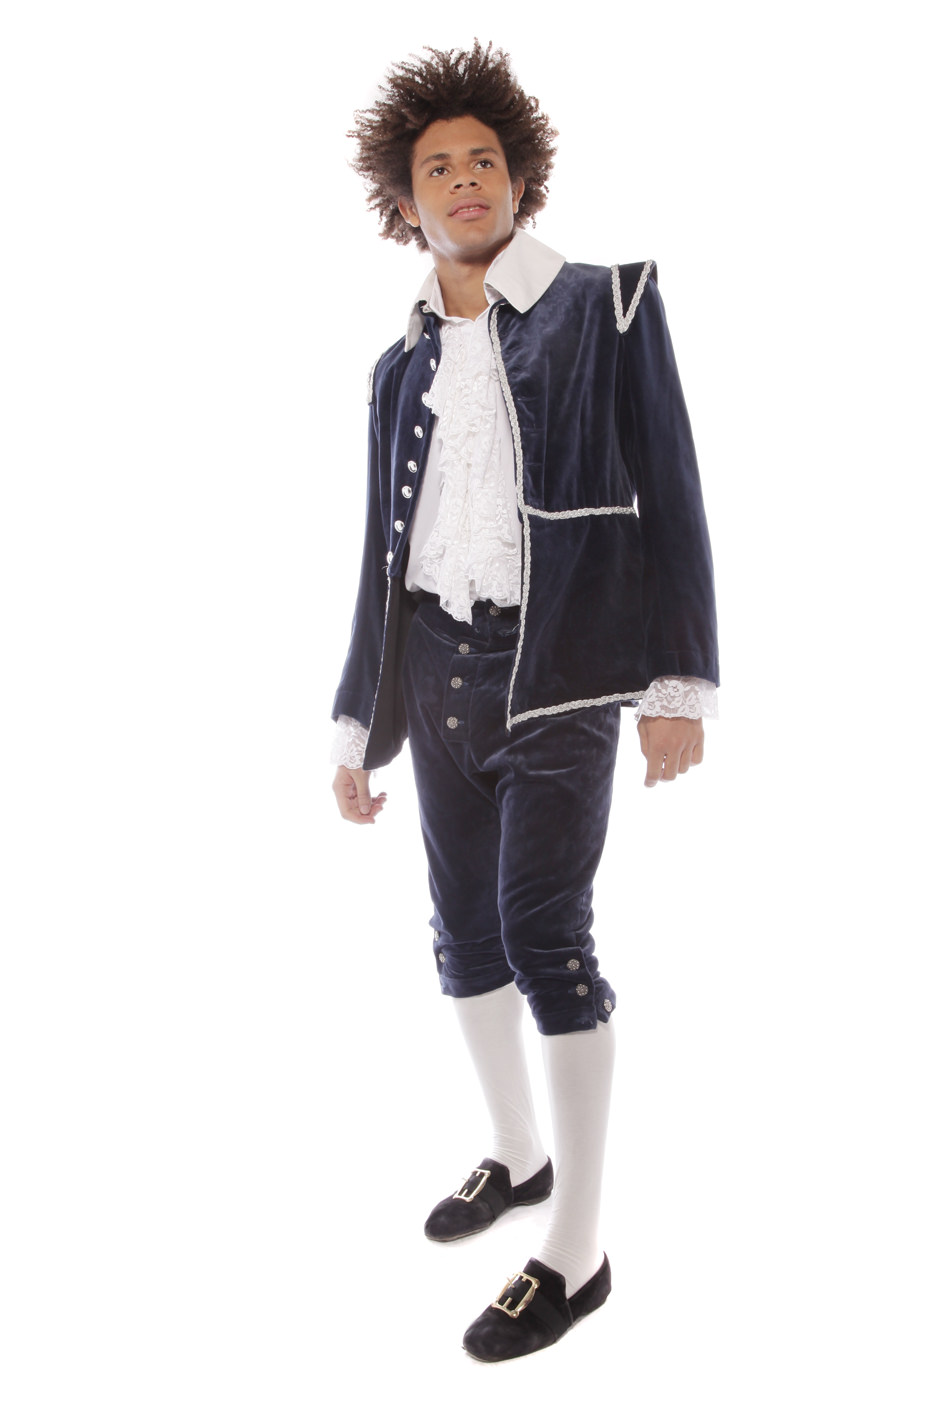 17TH CENTURY MAN'S INDIGO BLUE VELVET COSTUME